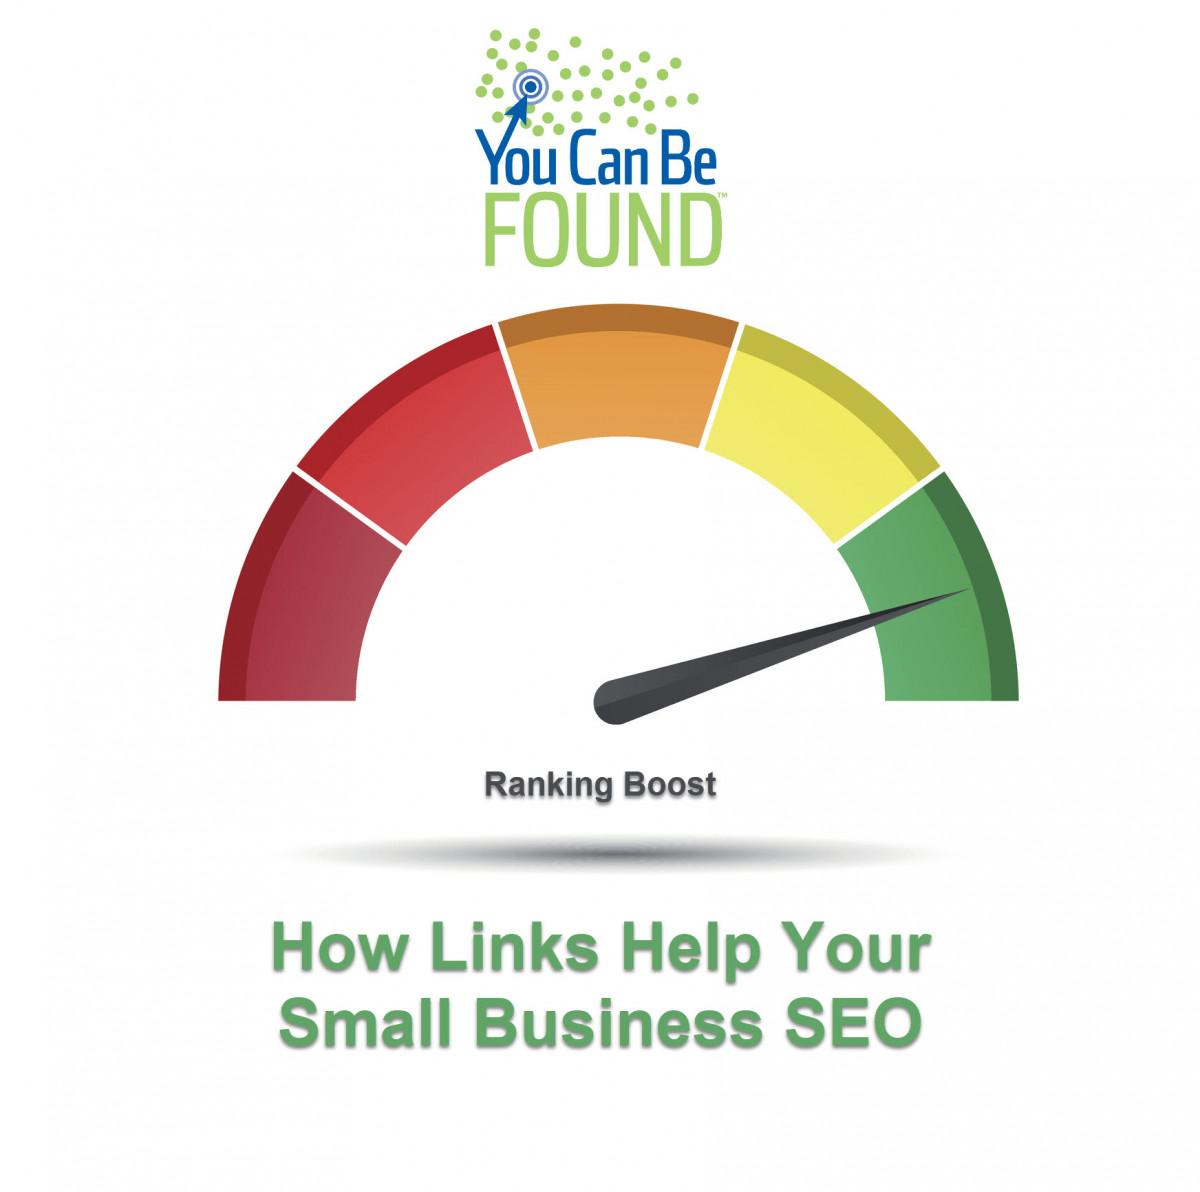 How Links Help Small Business SEO